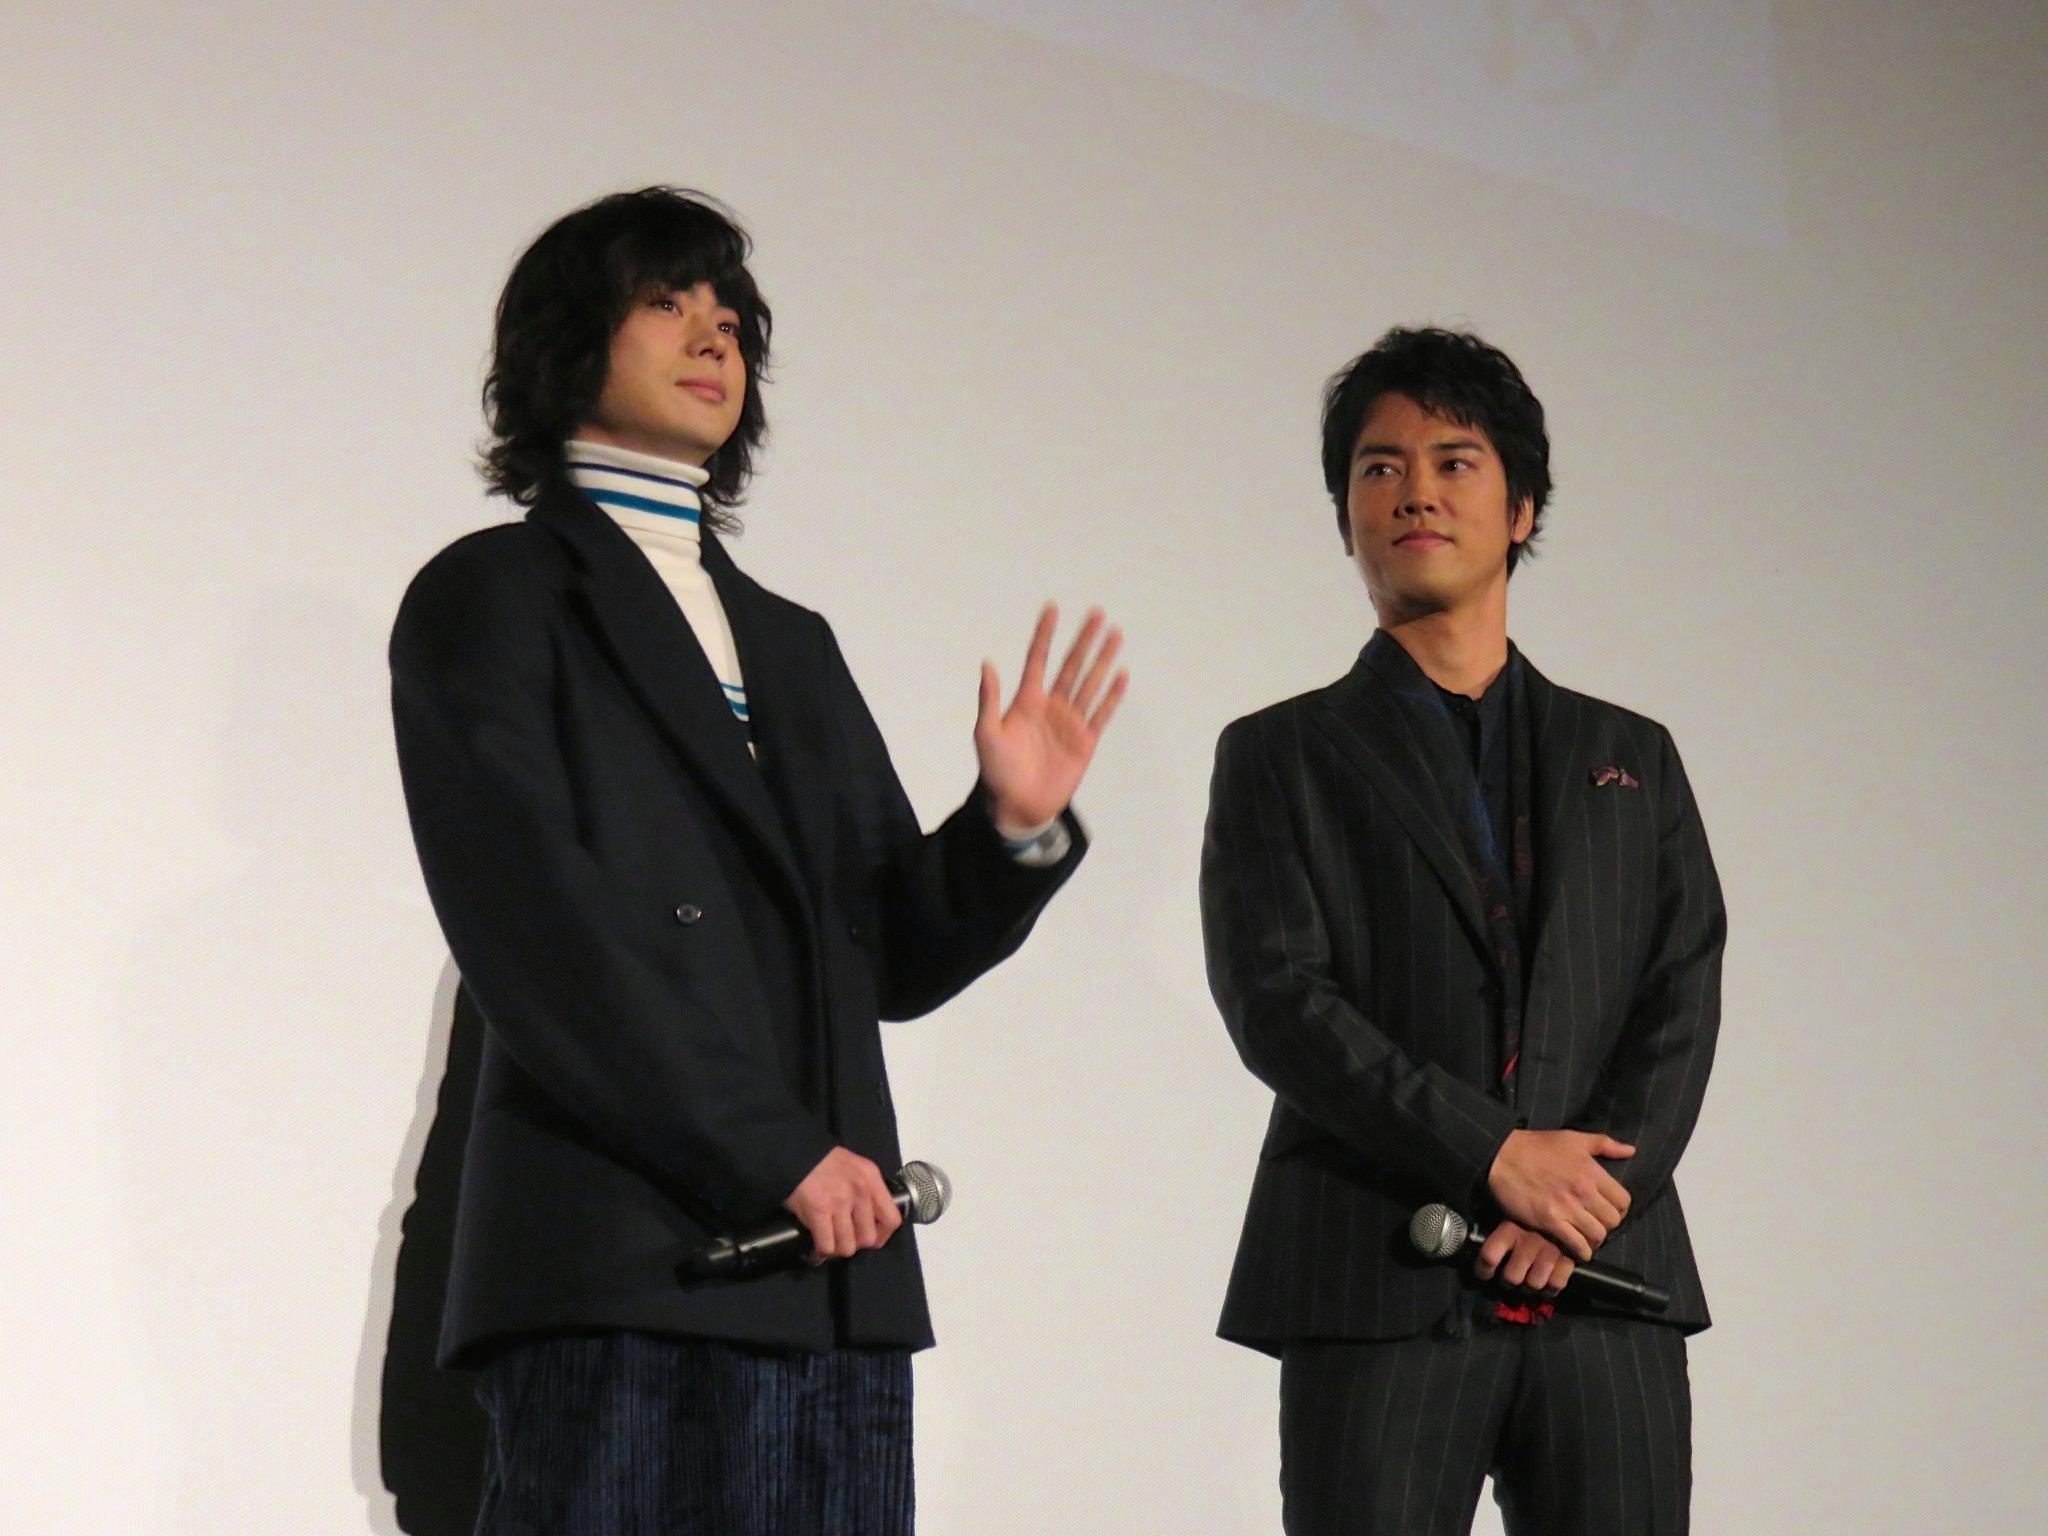 http://news.yoshimoto.co.jp/20171201003335-888f8bad528f0f7692a54ab11857b6dc9a9a3290.jpg